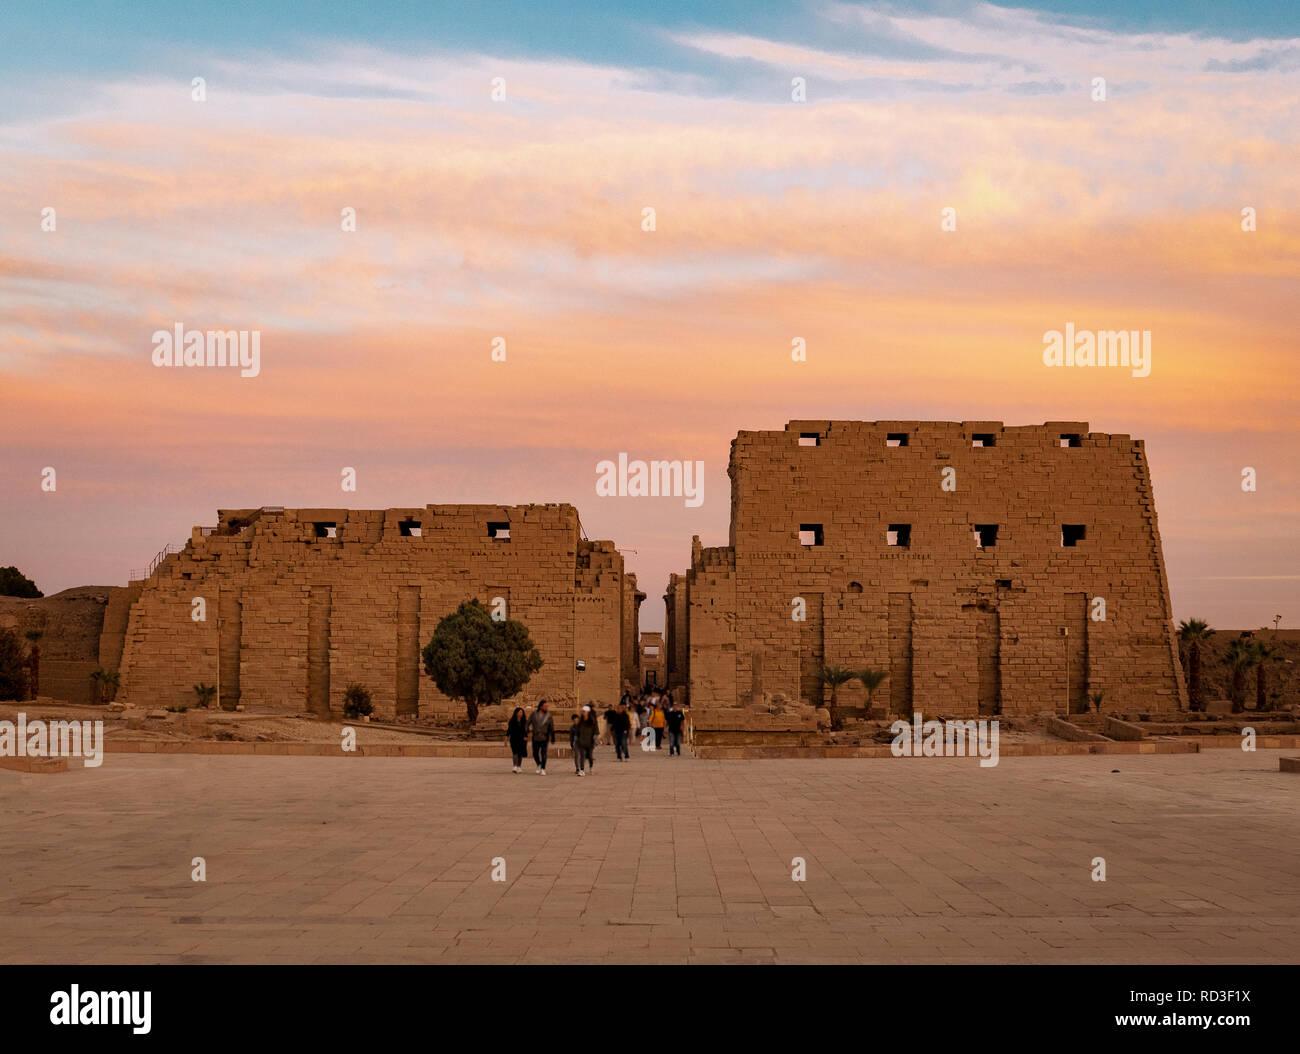 Karnak Temple facade at sunset in Luxor Egypt Stock Photo